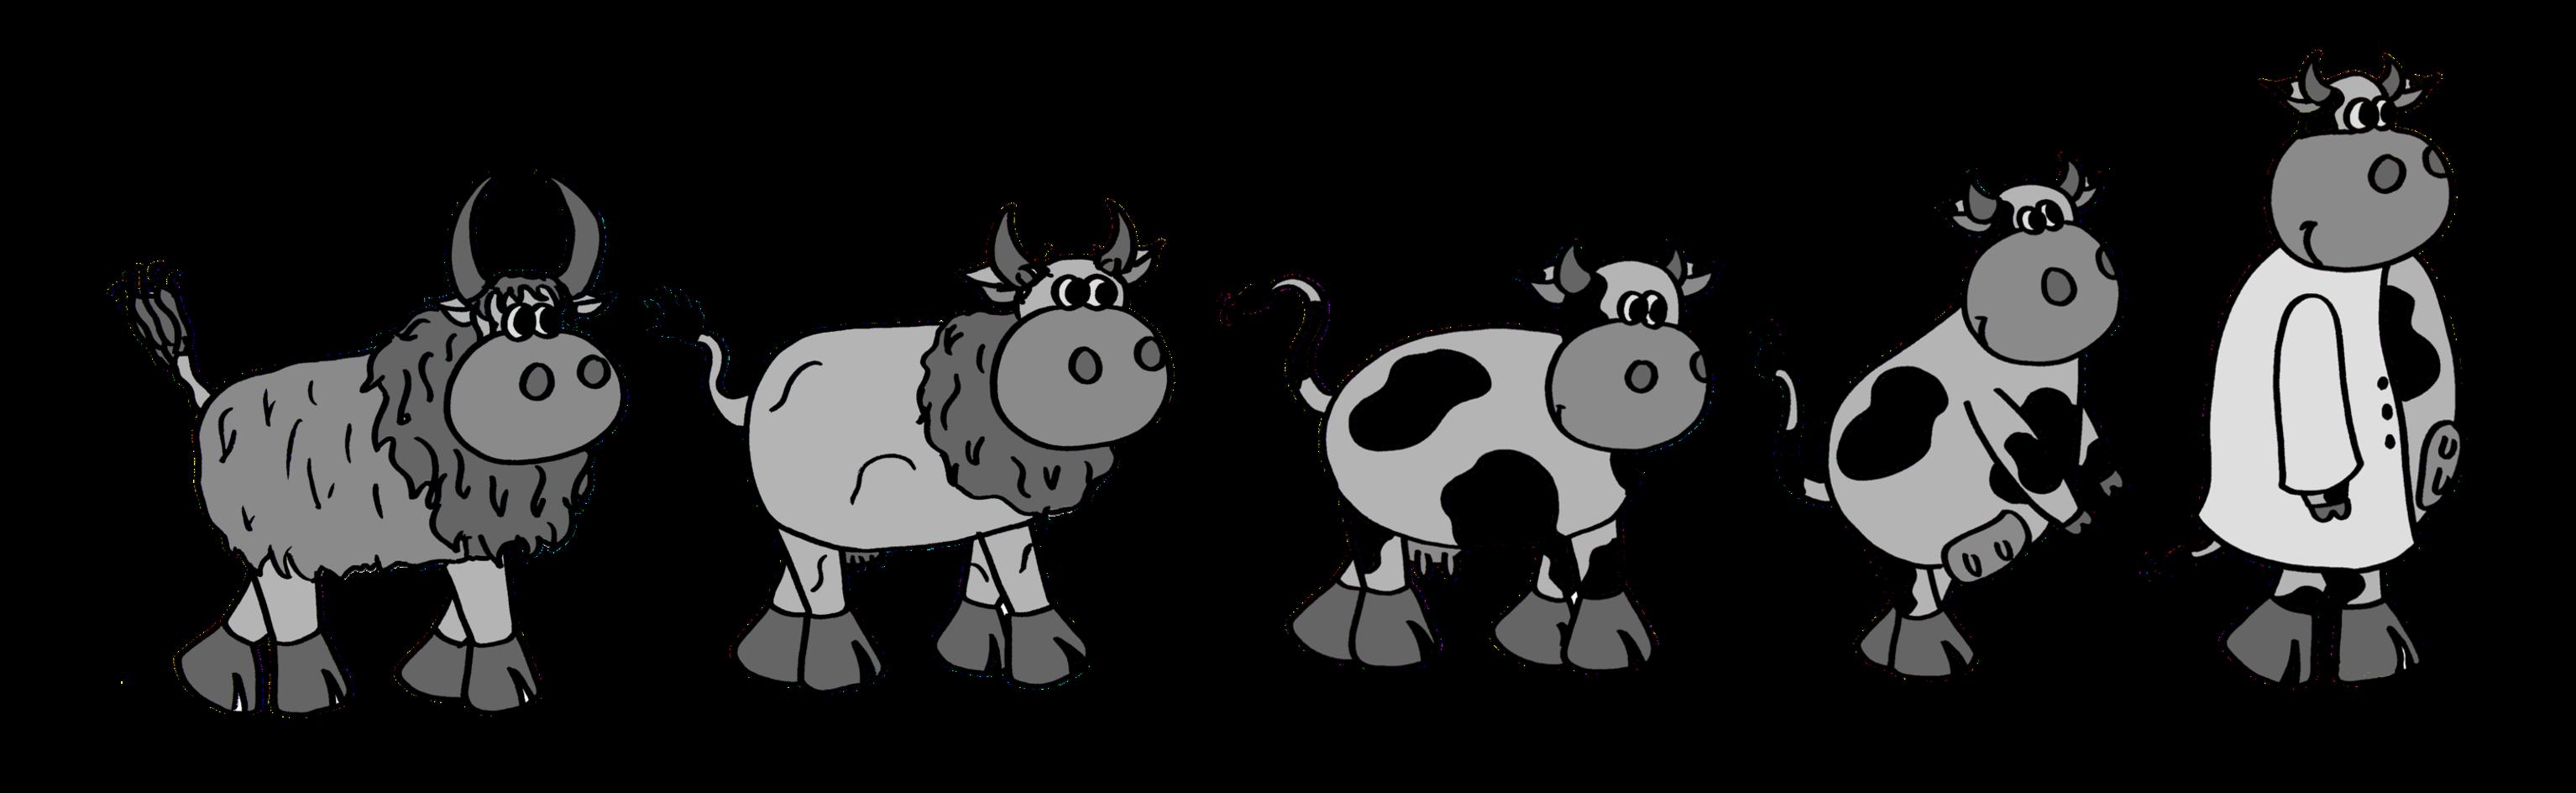 Team braunschweig project content. Cows clipart digestive system